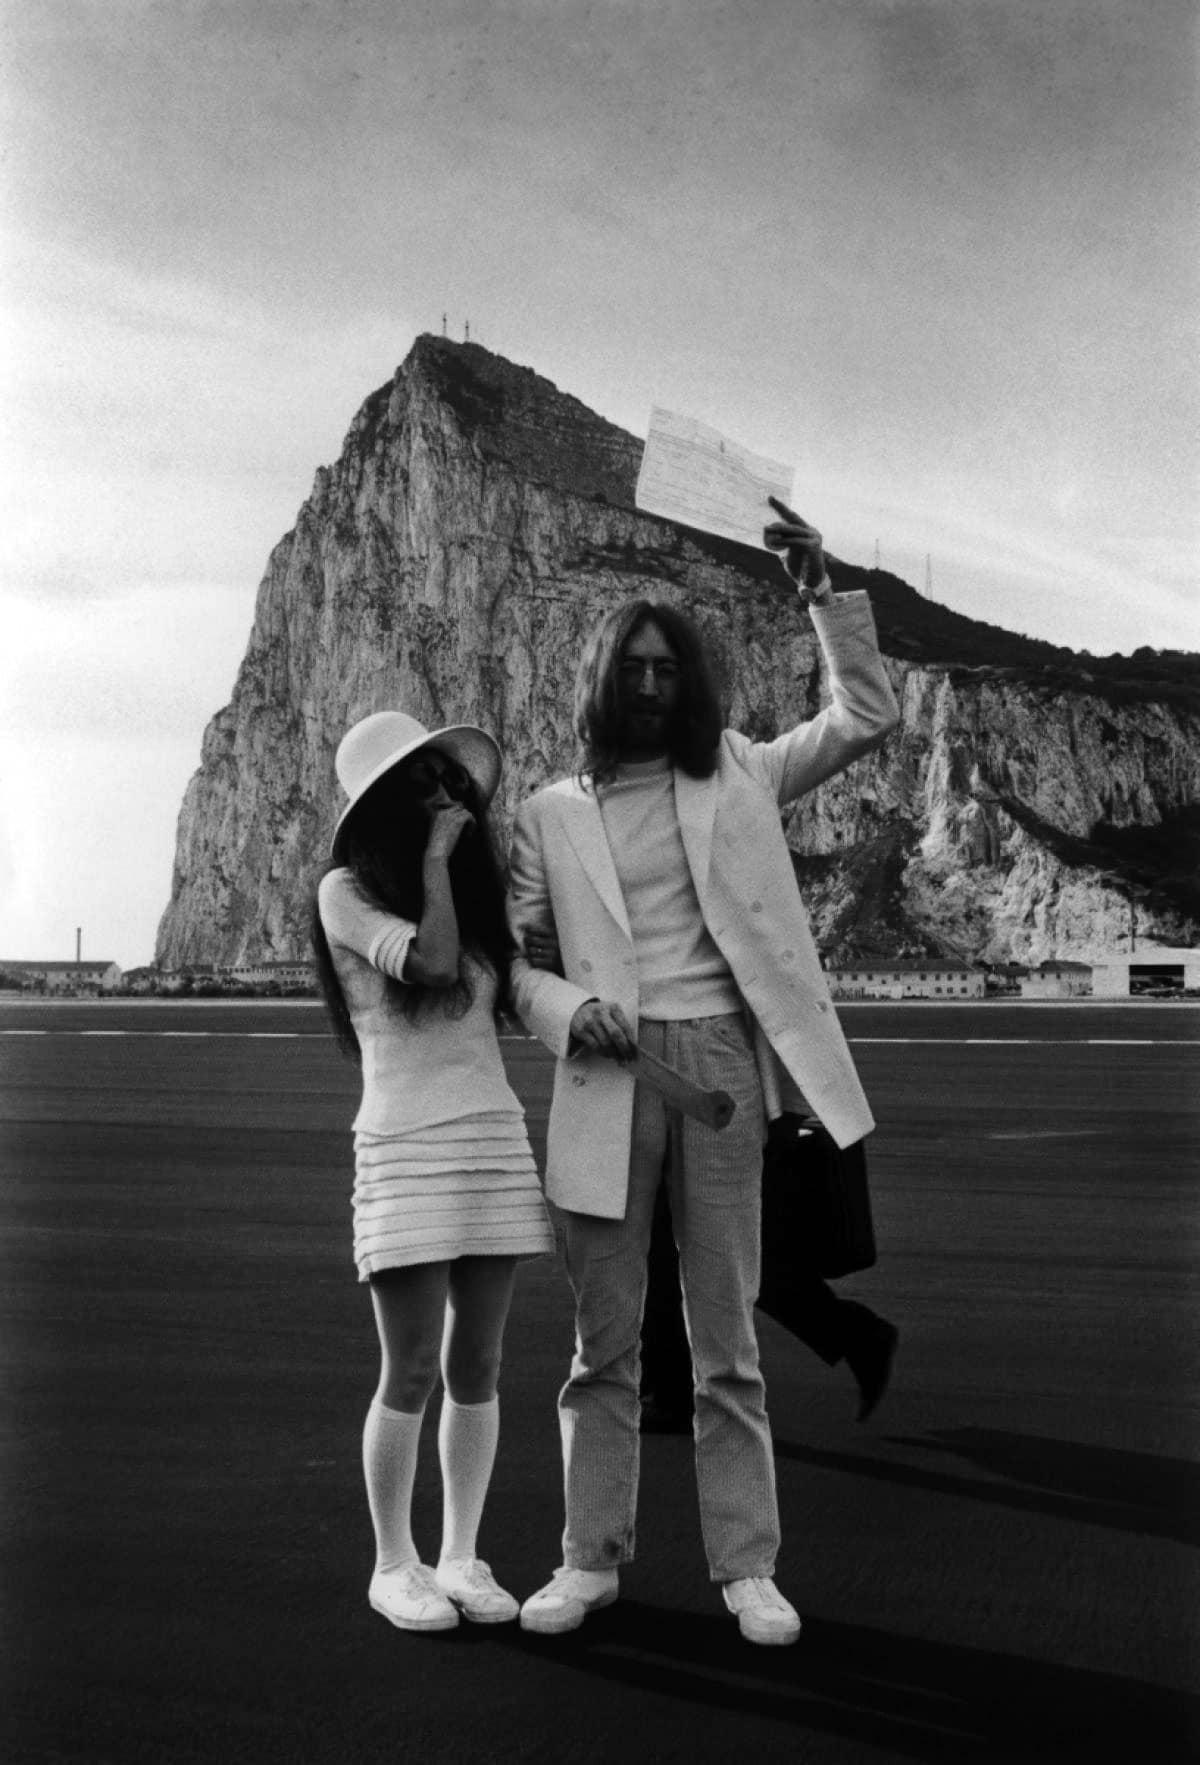 Yoko Ono and John Lennon at Gibraltar on their wedding day, March 20, 1969.